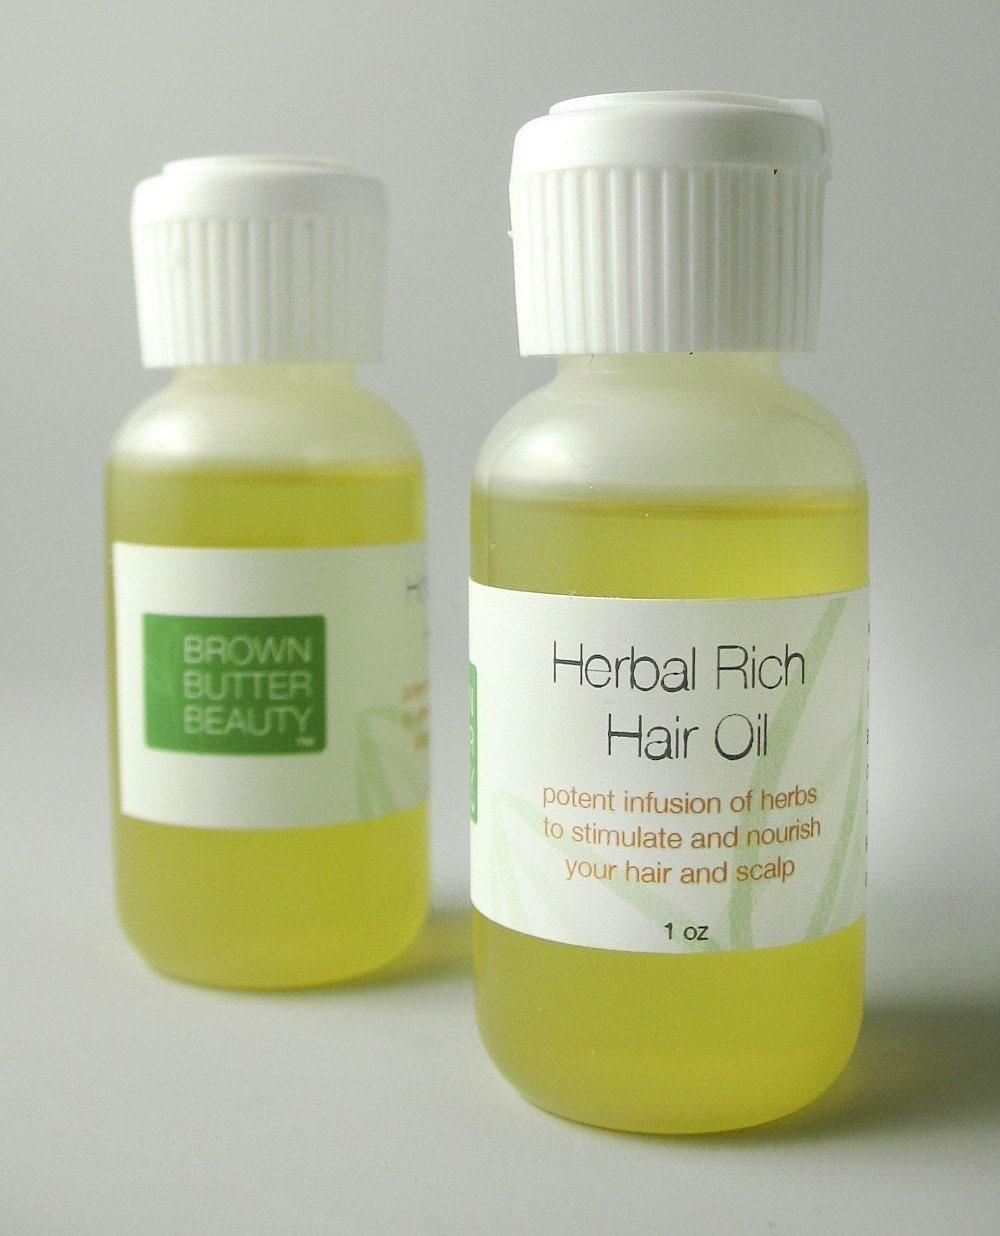 Herbal Rich Hair Oil - Neem, Nettle, Burdock, Comfrey Root, Chamomile, Black Walnut Hull, Calendula Flowers, Essential Oil